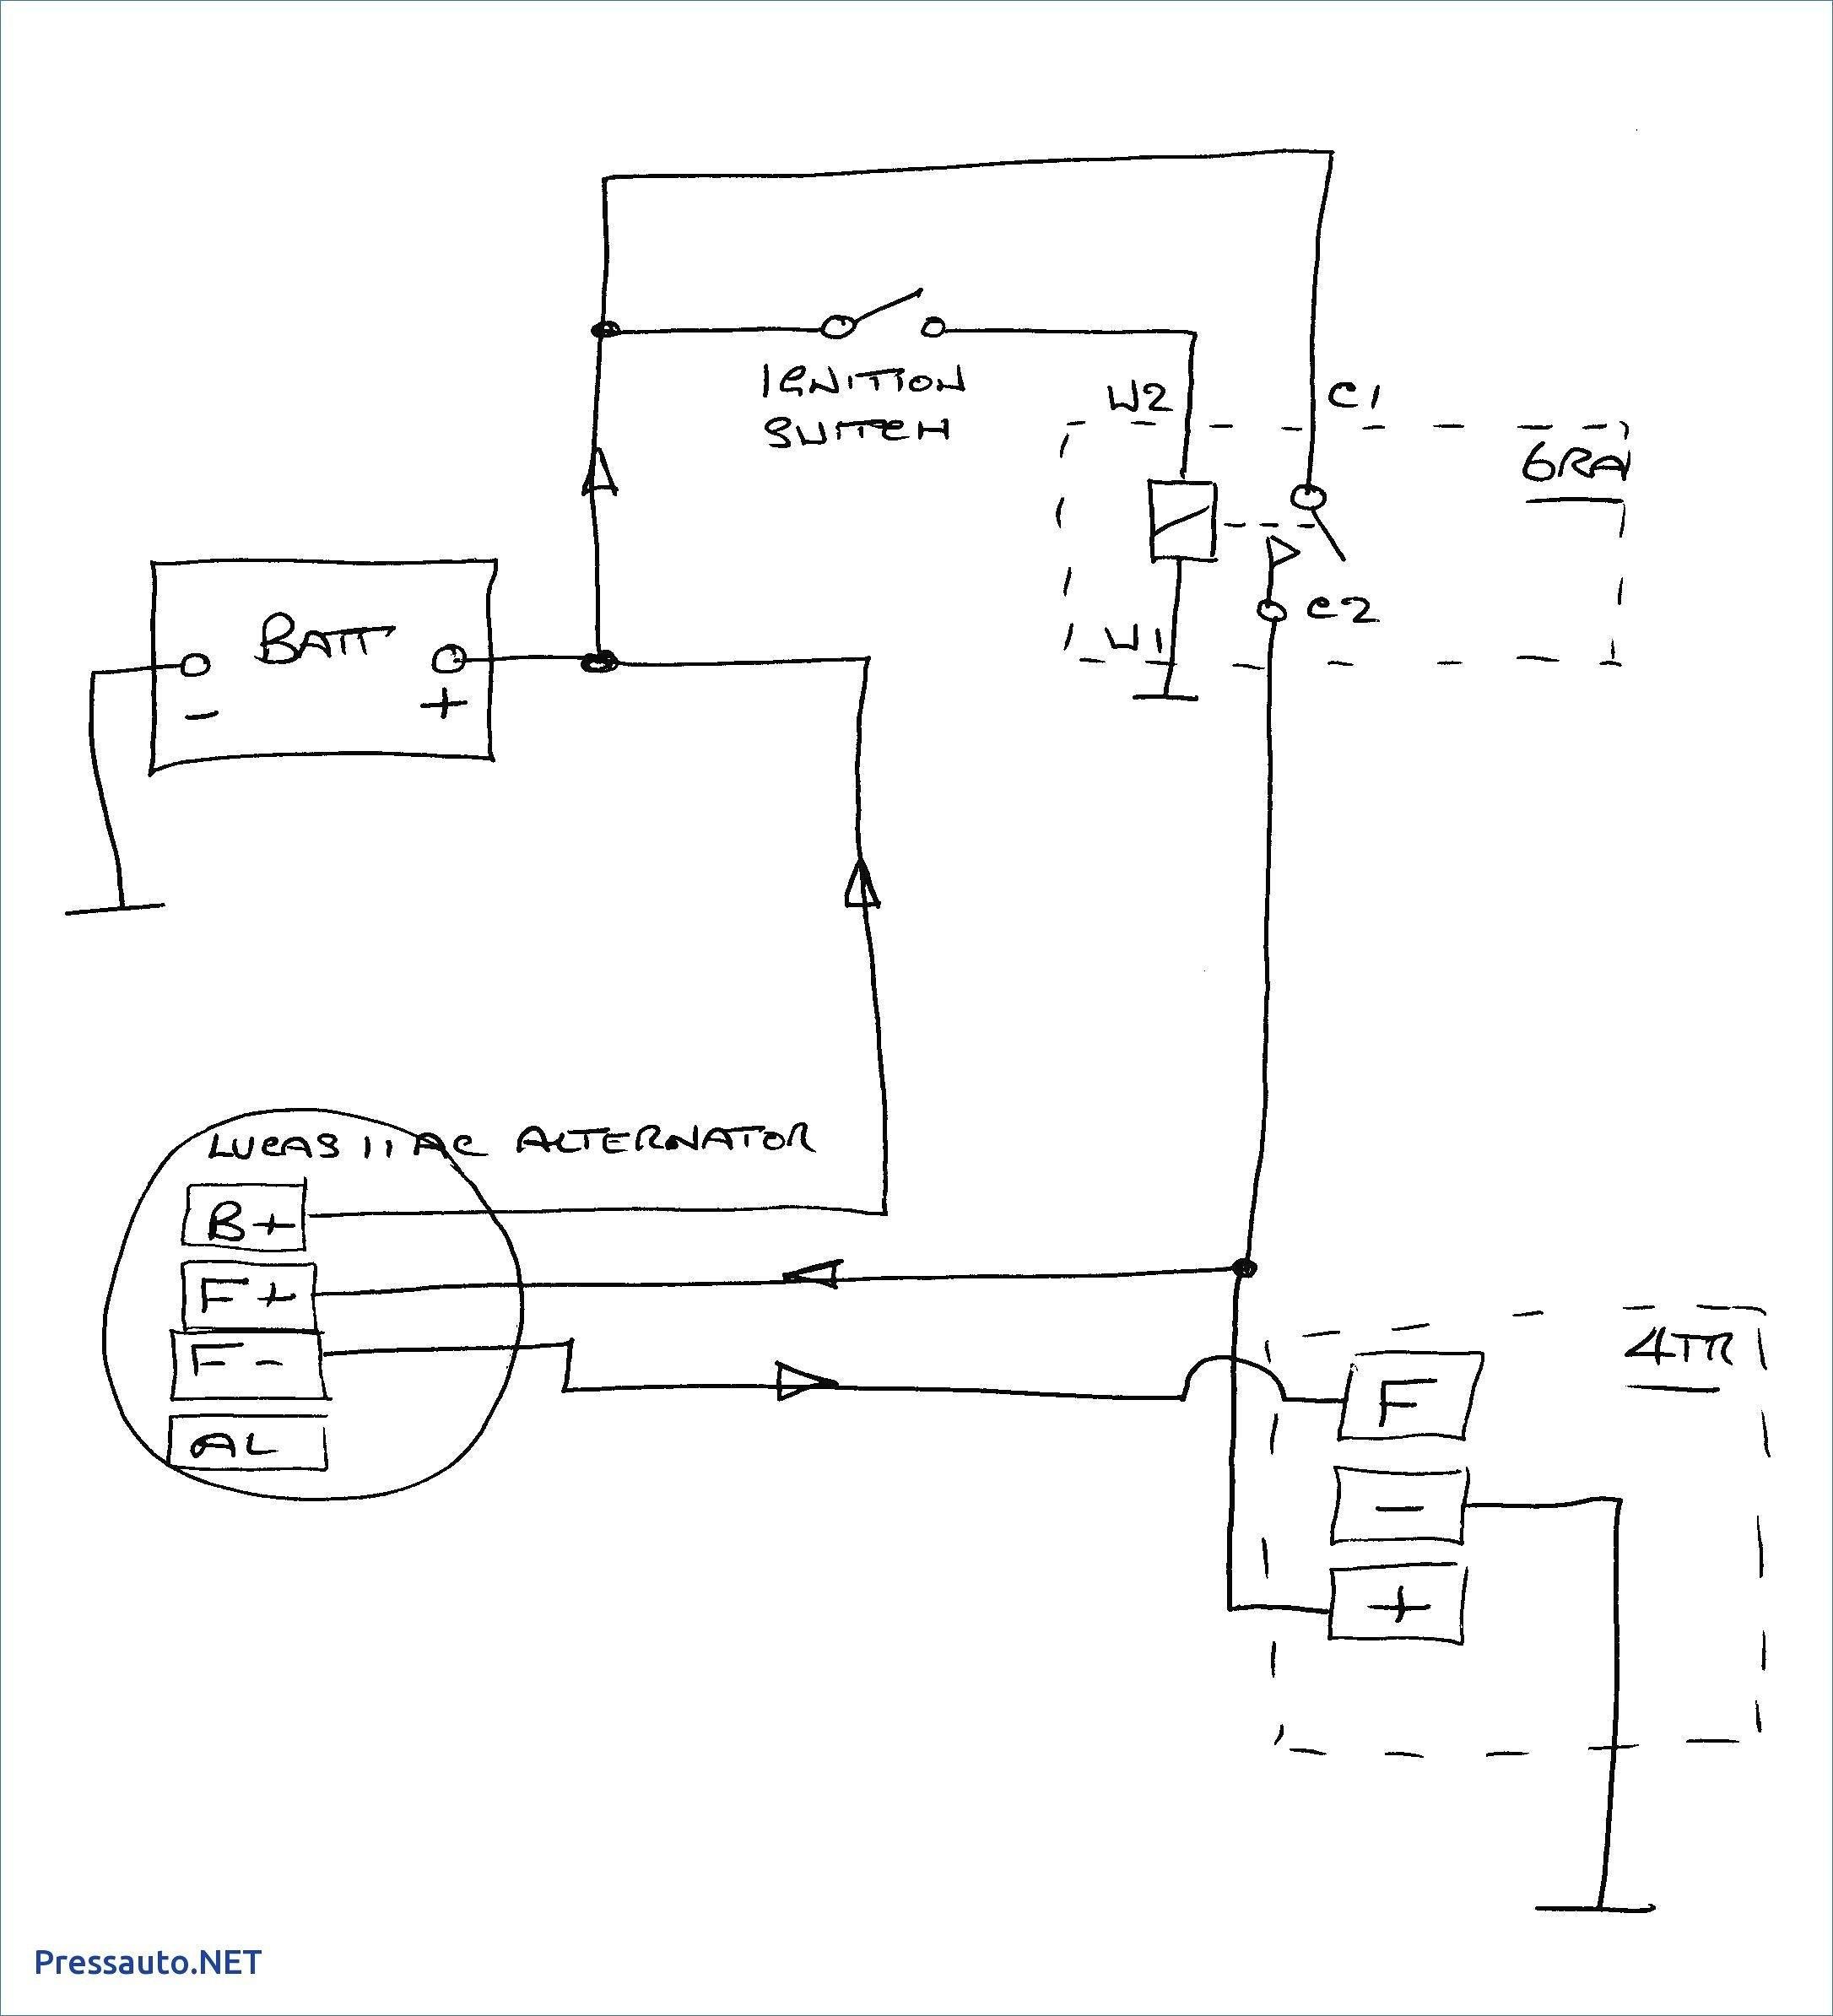 Single Wire Alternator Wiring Diagram Chevy 3 Wire Alternator Diagram Electrical Diagram Schematics Of Single Wire Alternator Wiring Diagram